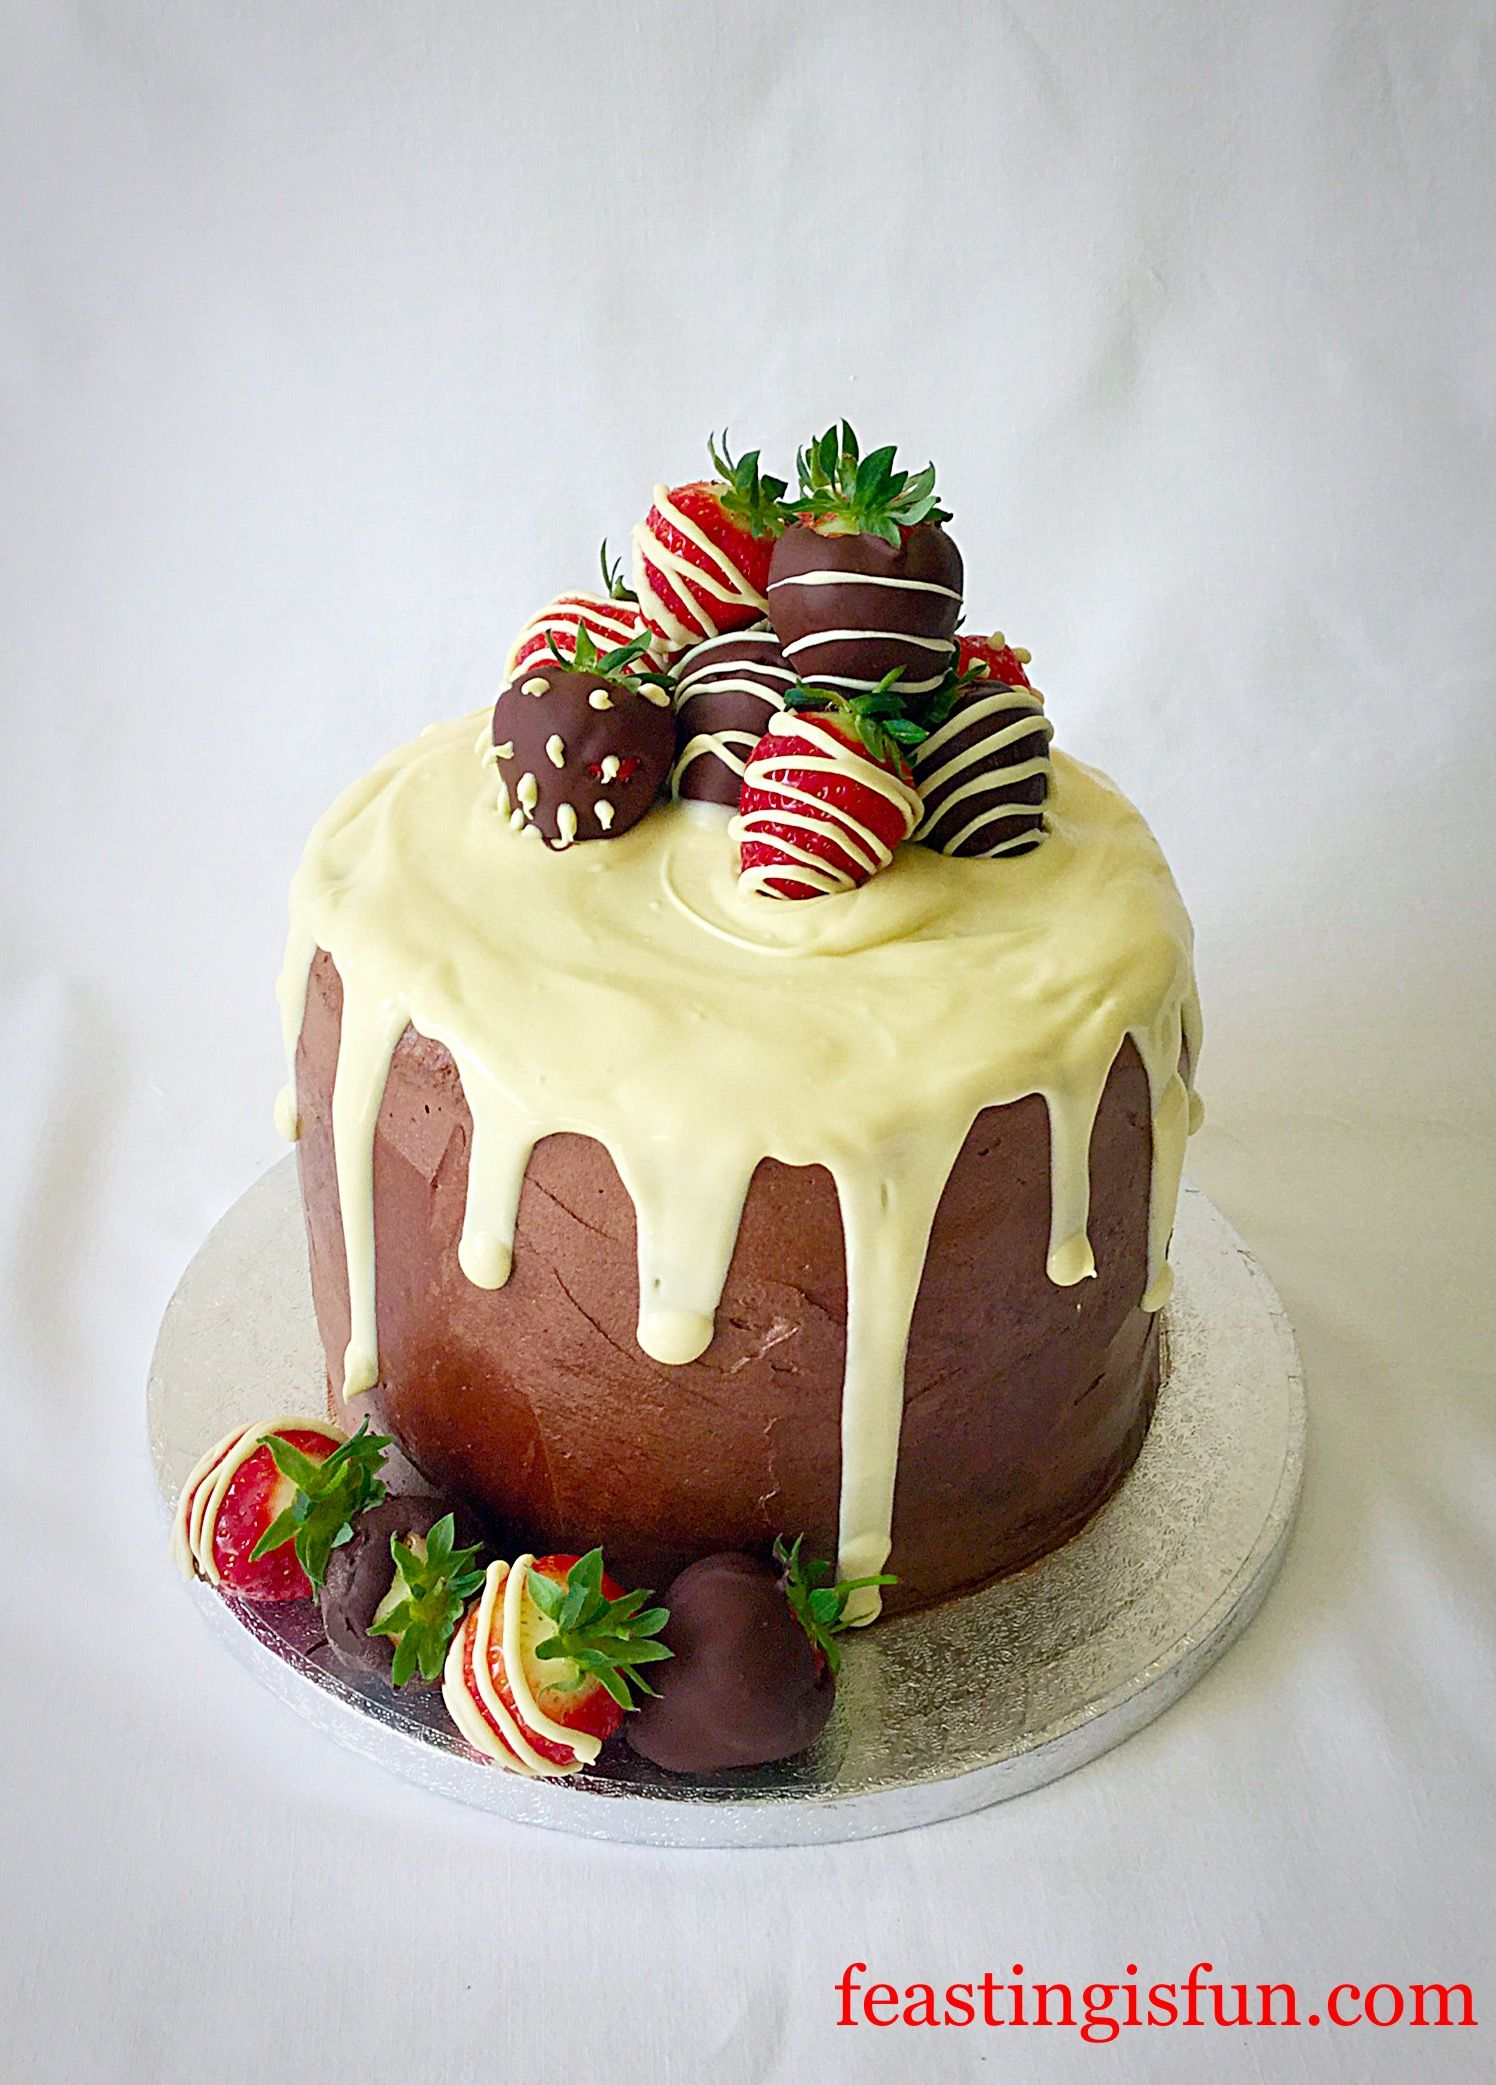 strawberry chocolate vanilla drip cake i crave pinterest cake drip cakes and chocolate. Black Bedroom Furniture Sets. Home Design Ideas